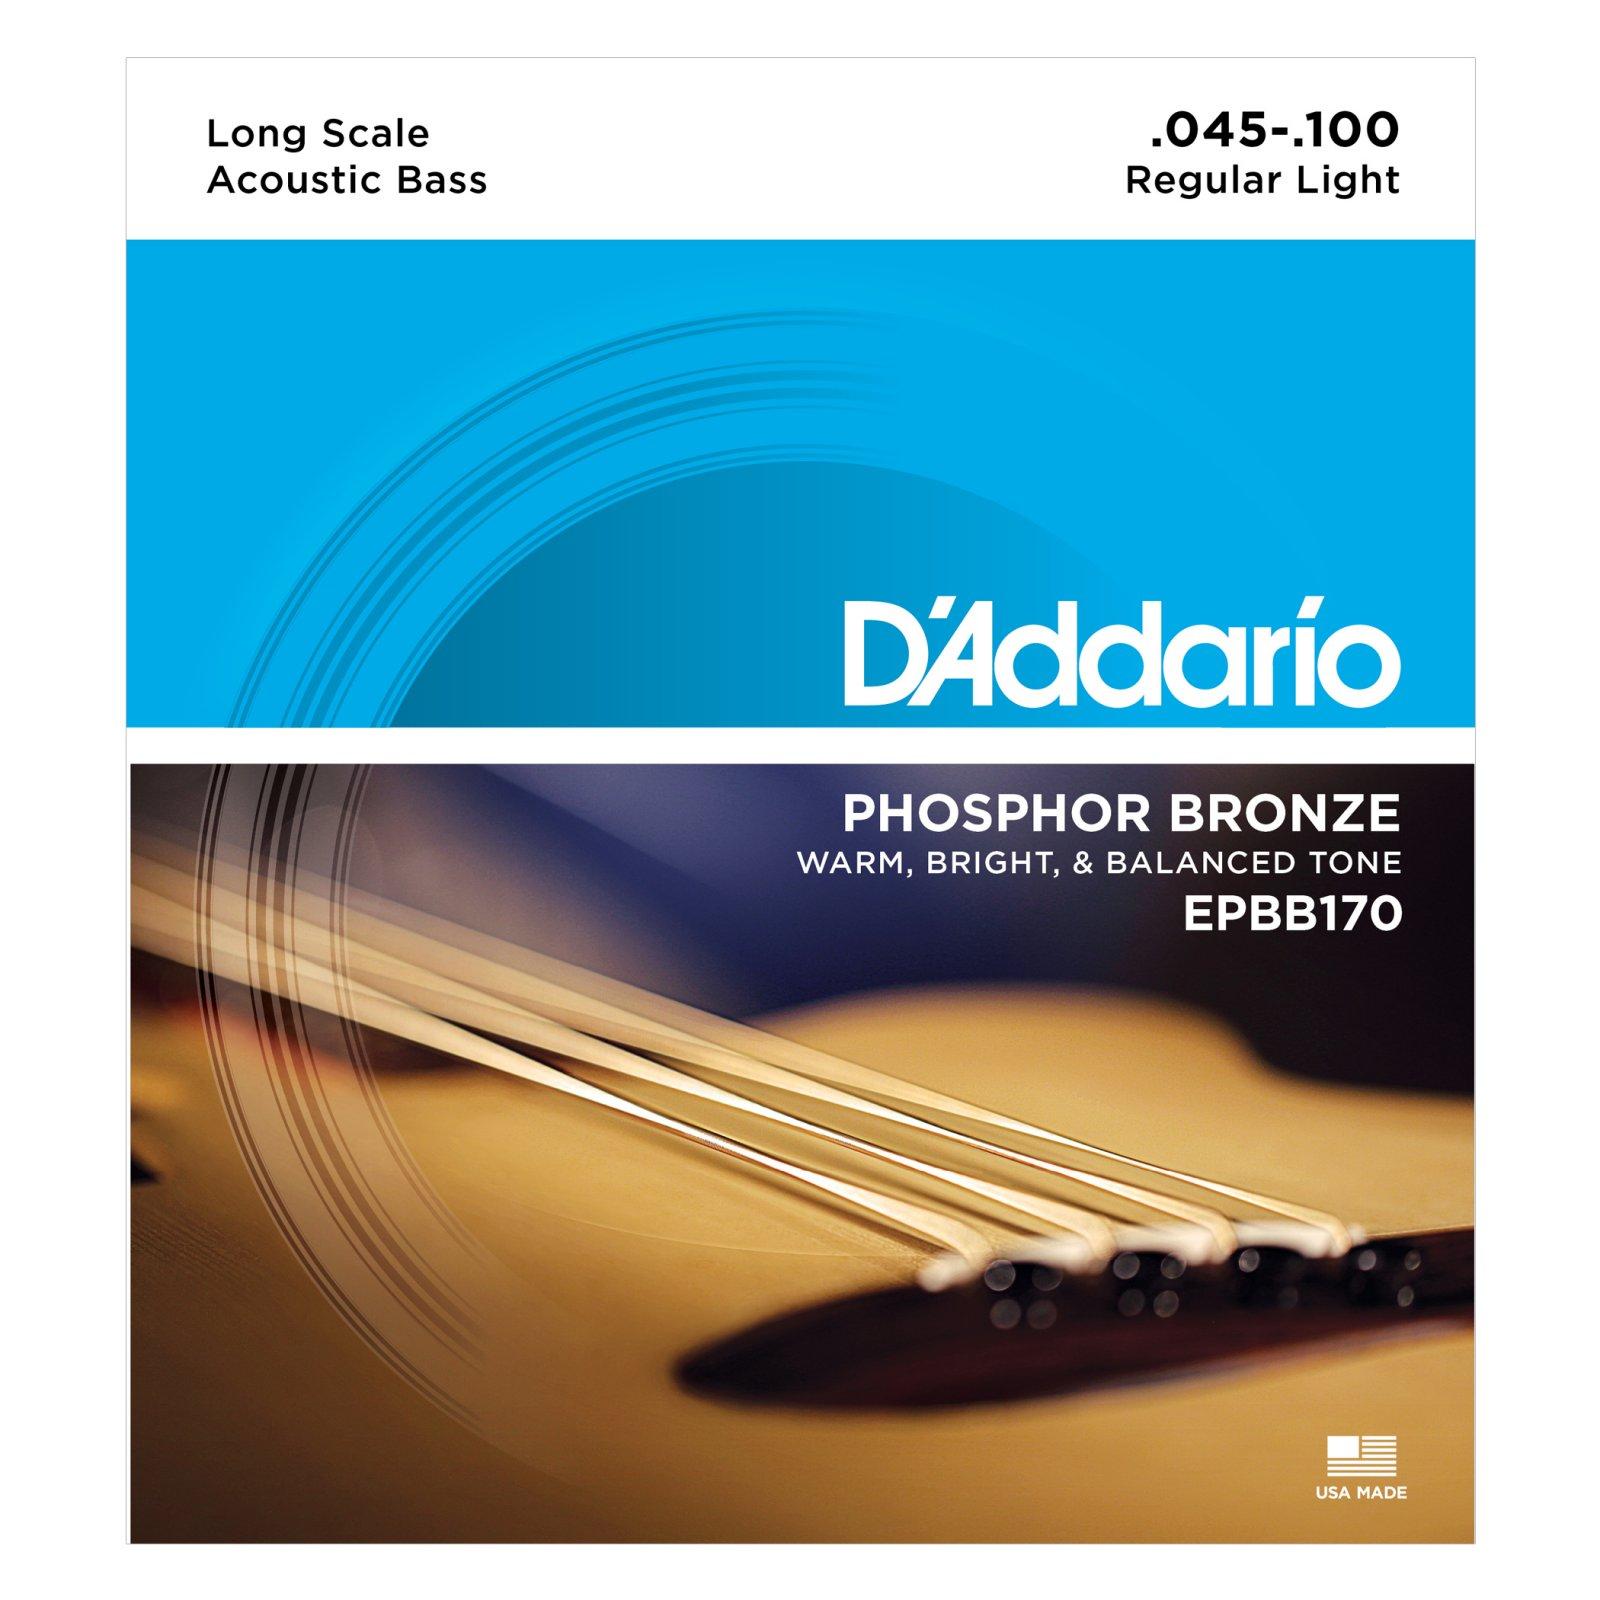 Daddario EPBB170 Phosphor Bronze Acoustic Bass 45-100